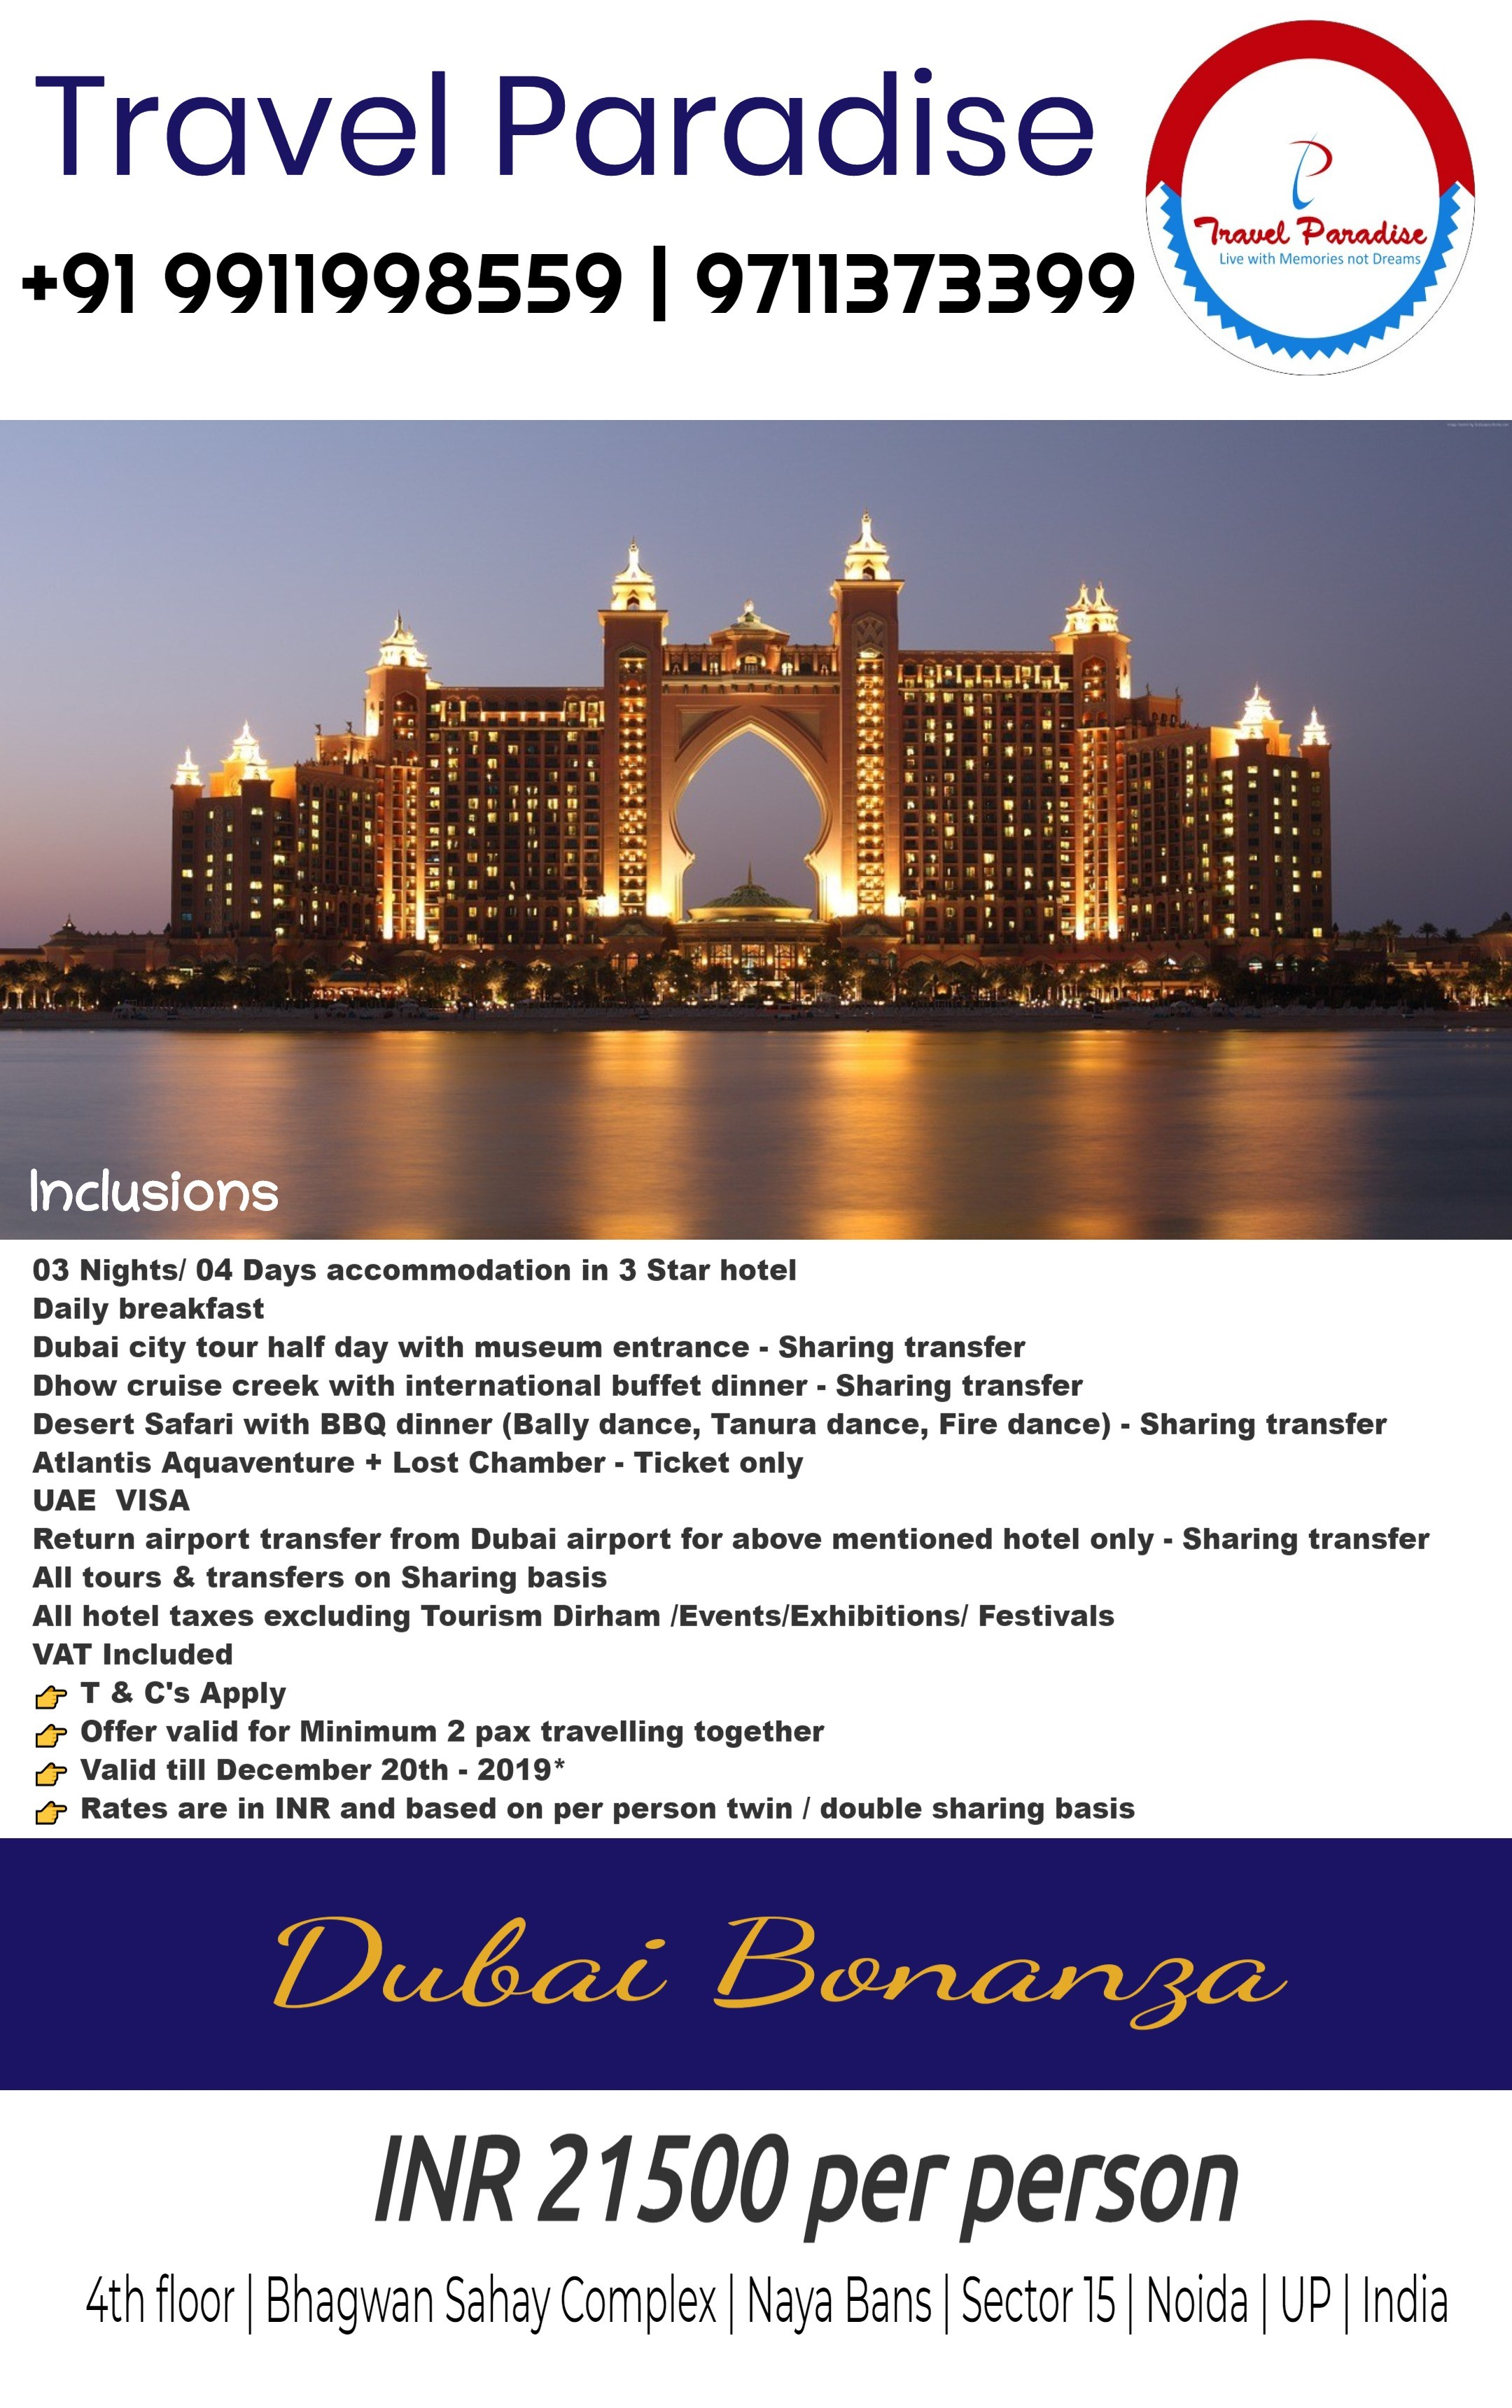 Dubai Bonanza